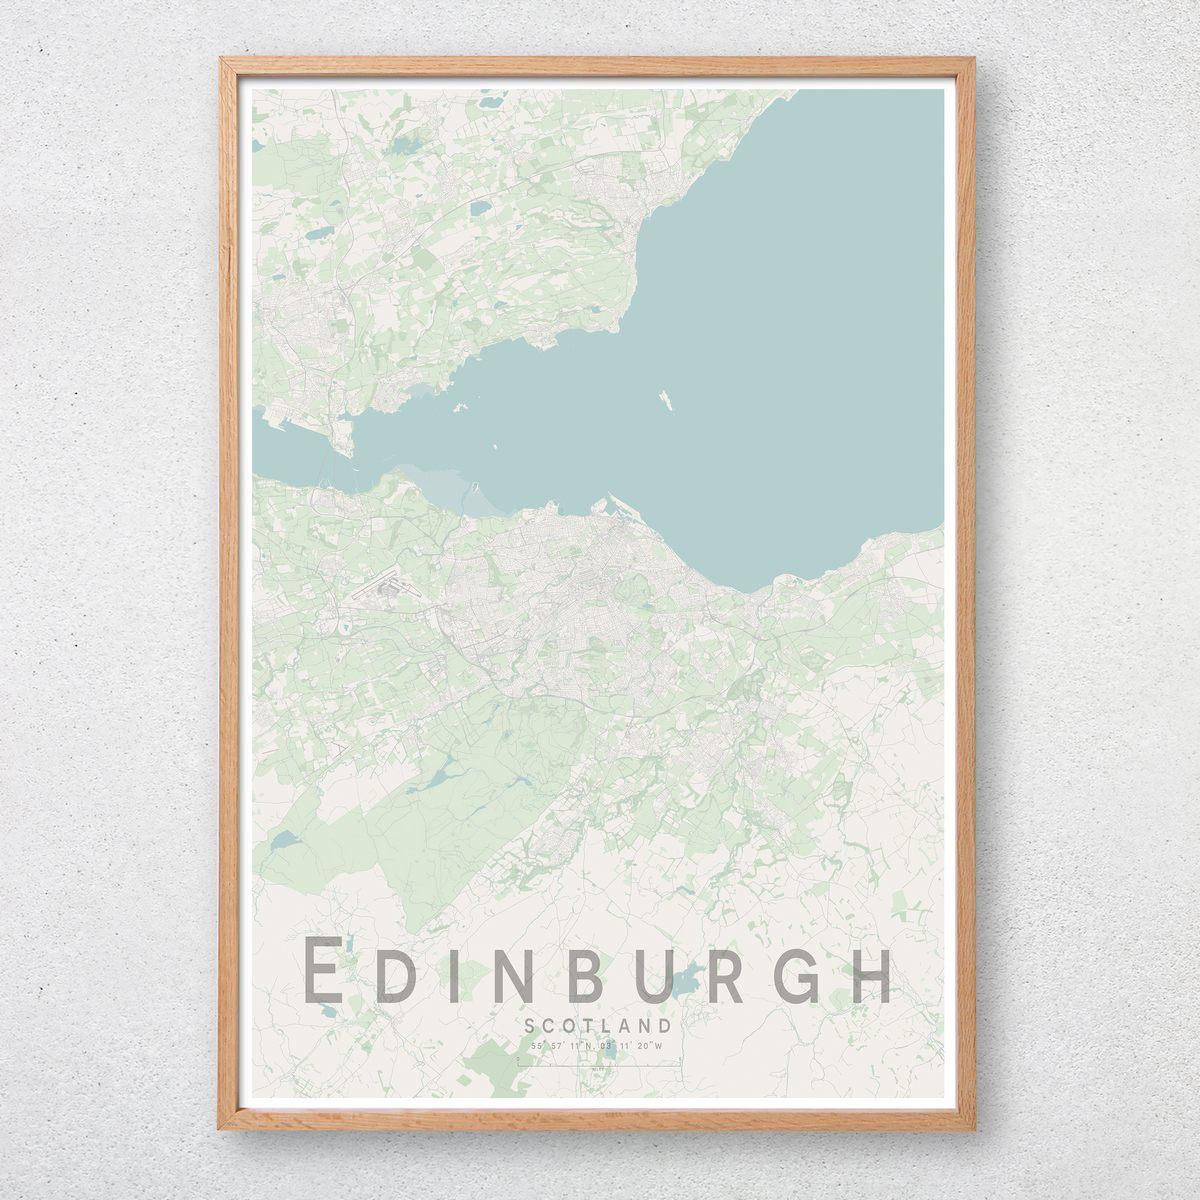 Scotland Wall Art Poster City Map Wall Decor A3 A2 A1 EDINBURGH Map Print